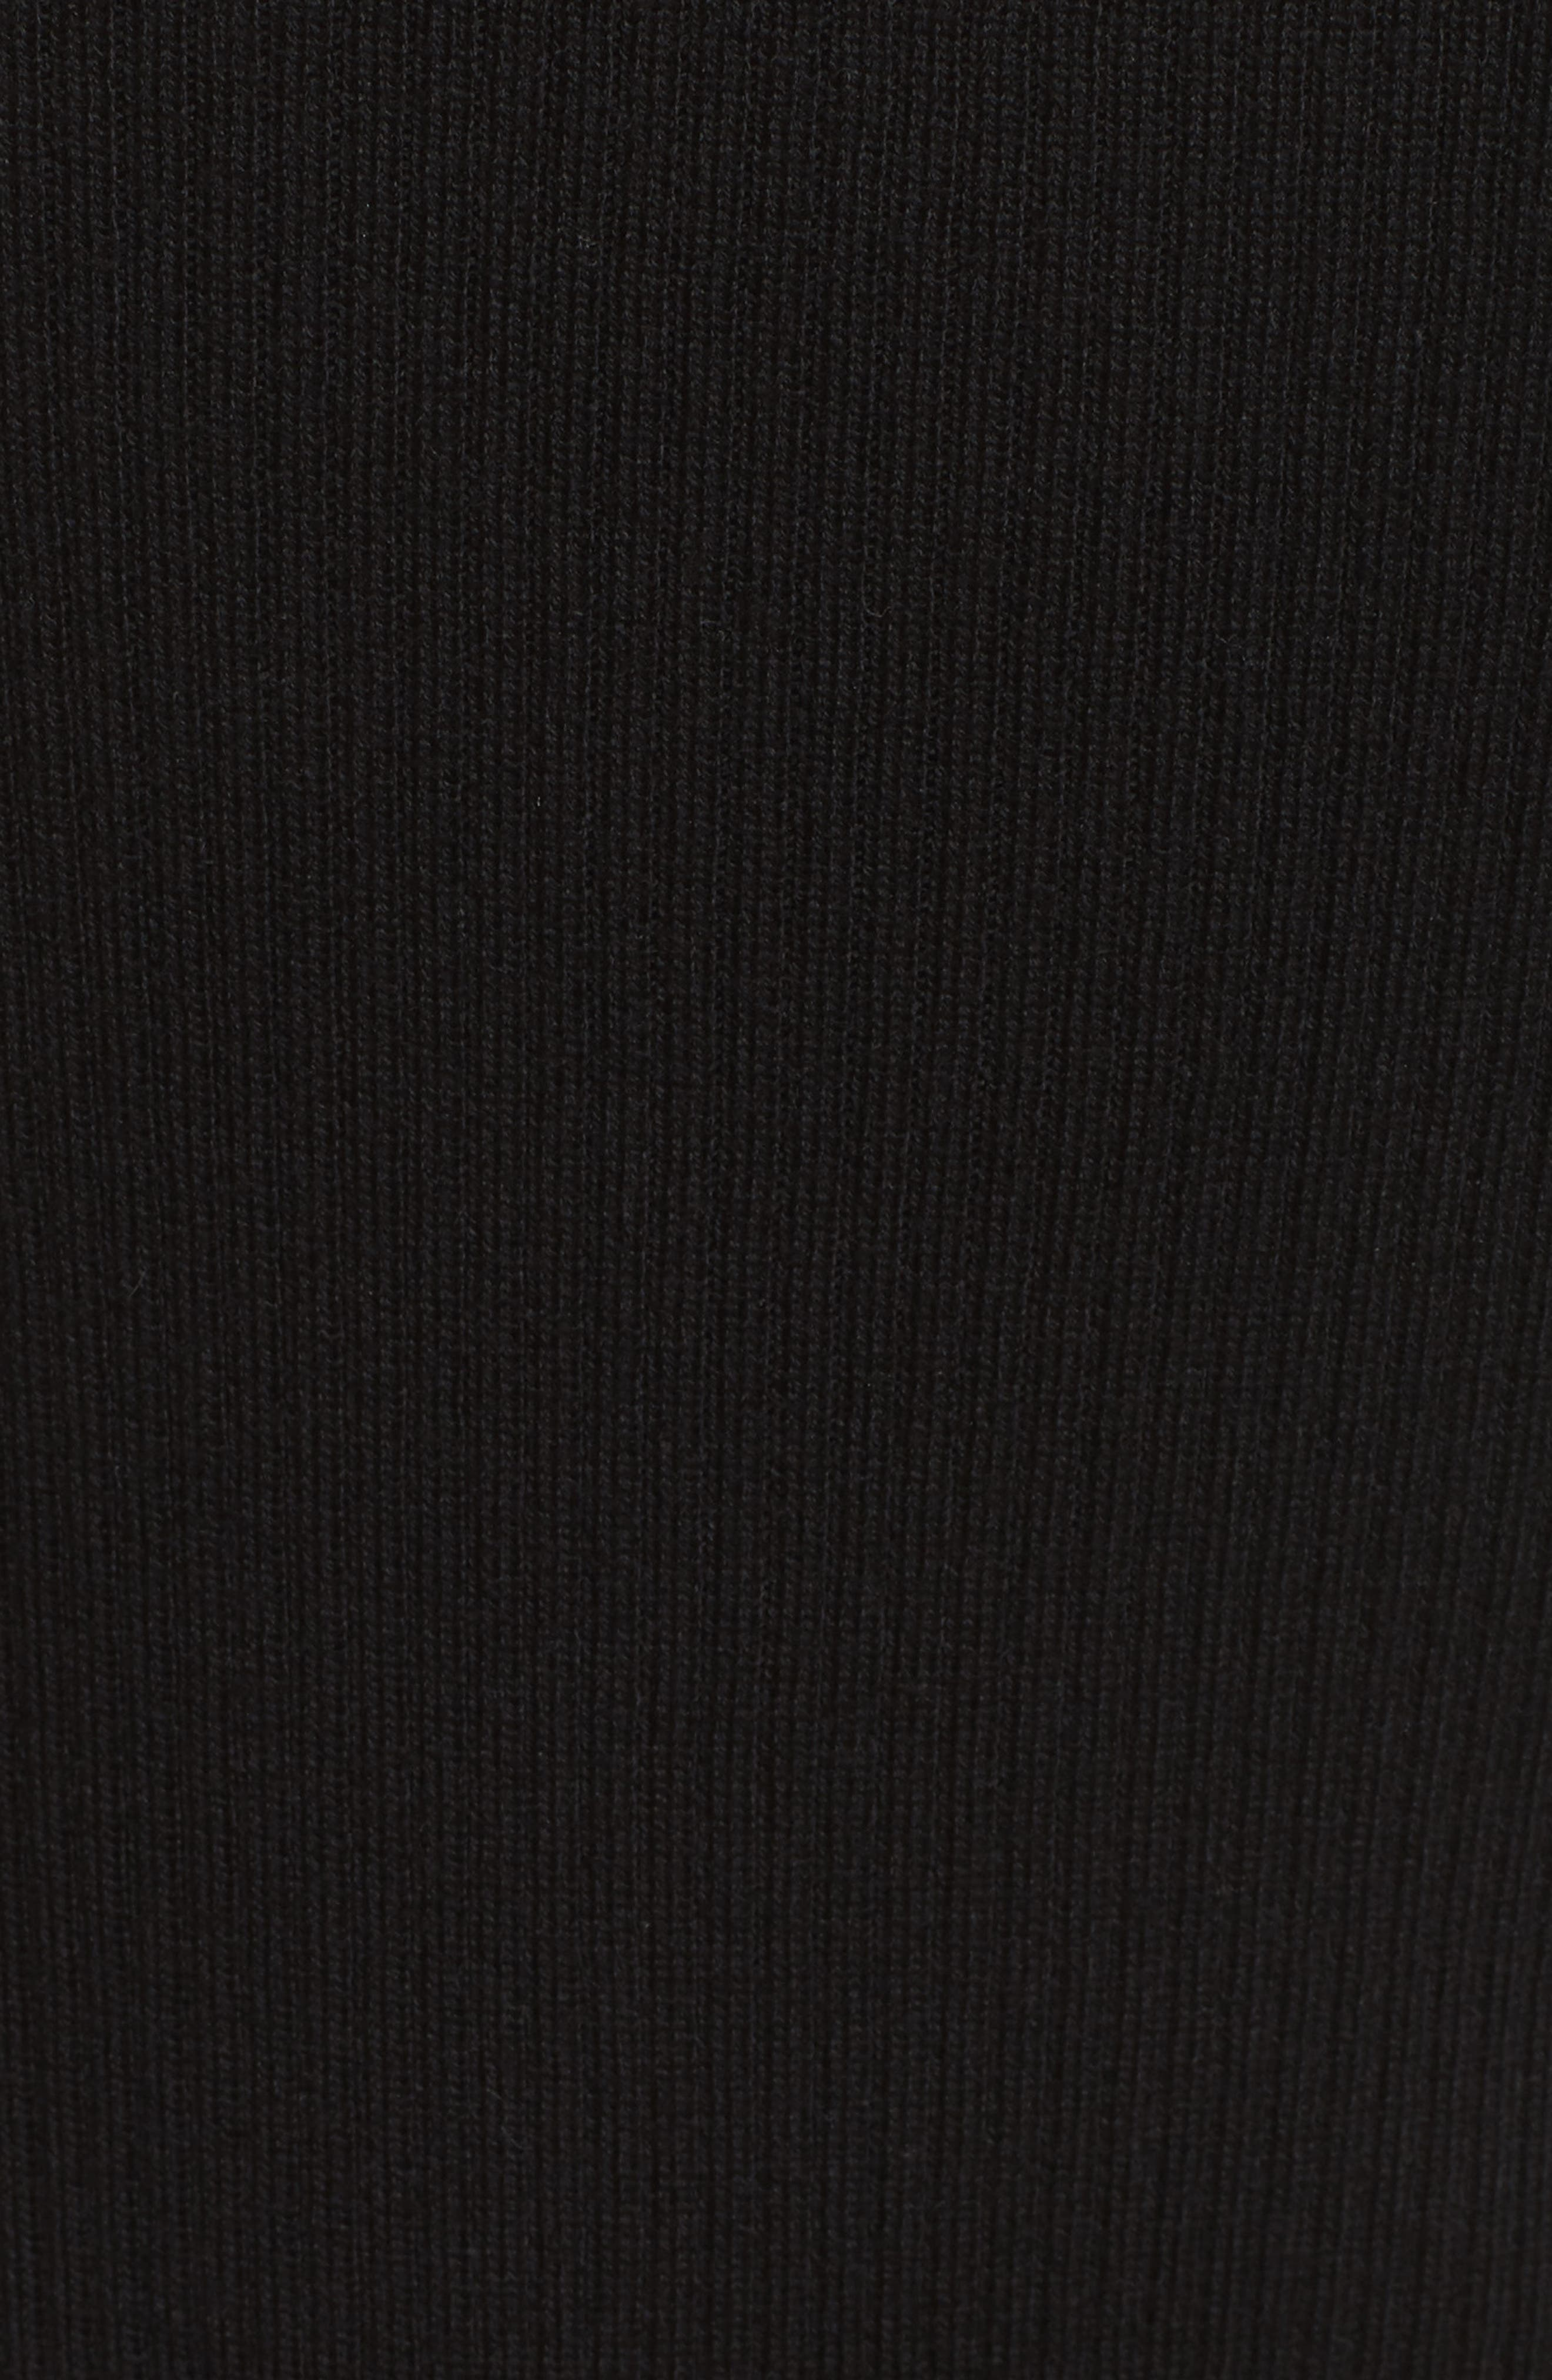 Off the Shoulder Sweater,                             Alternate thumbnail 6, color,                             Noir